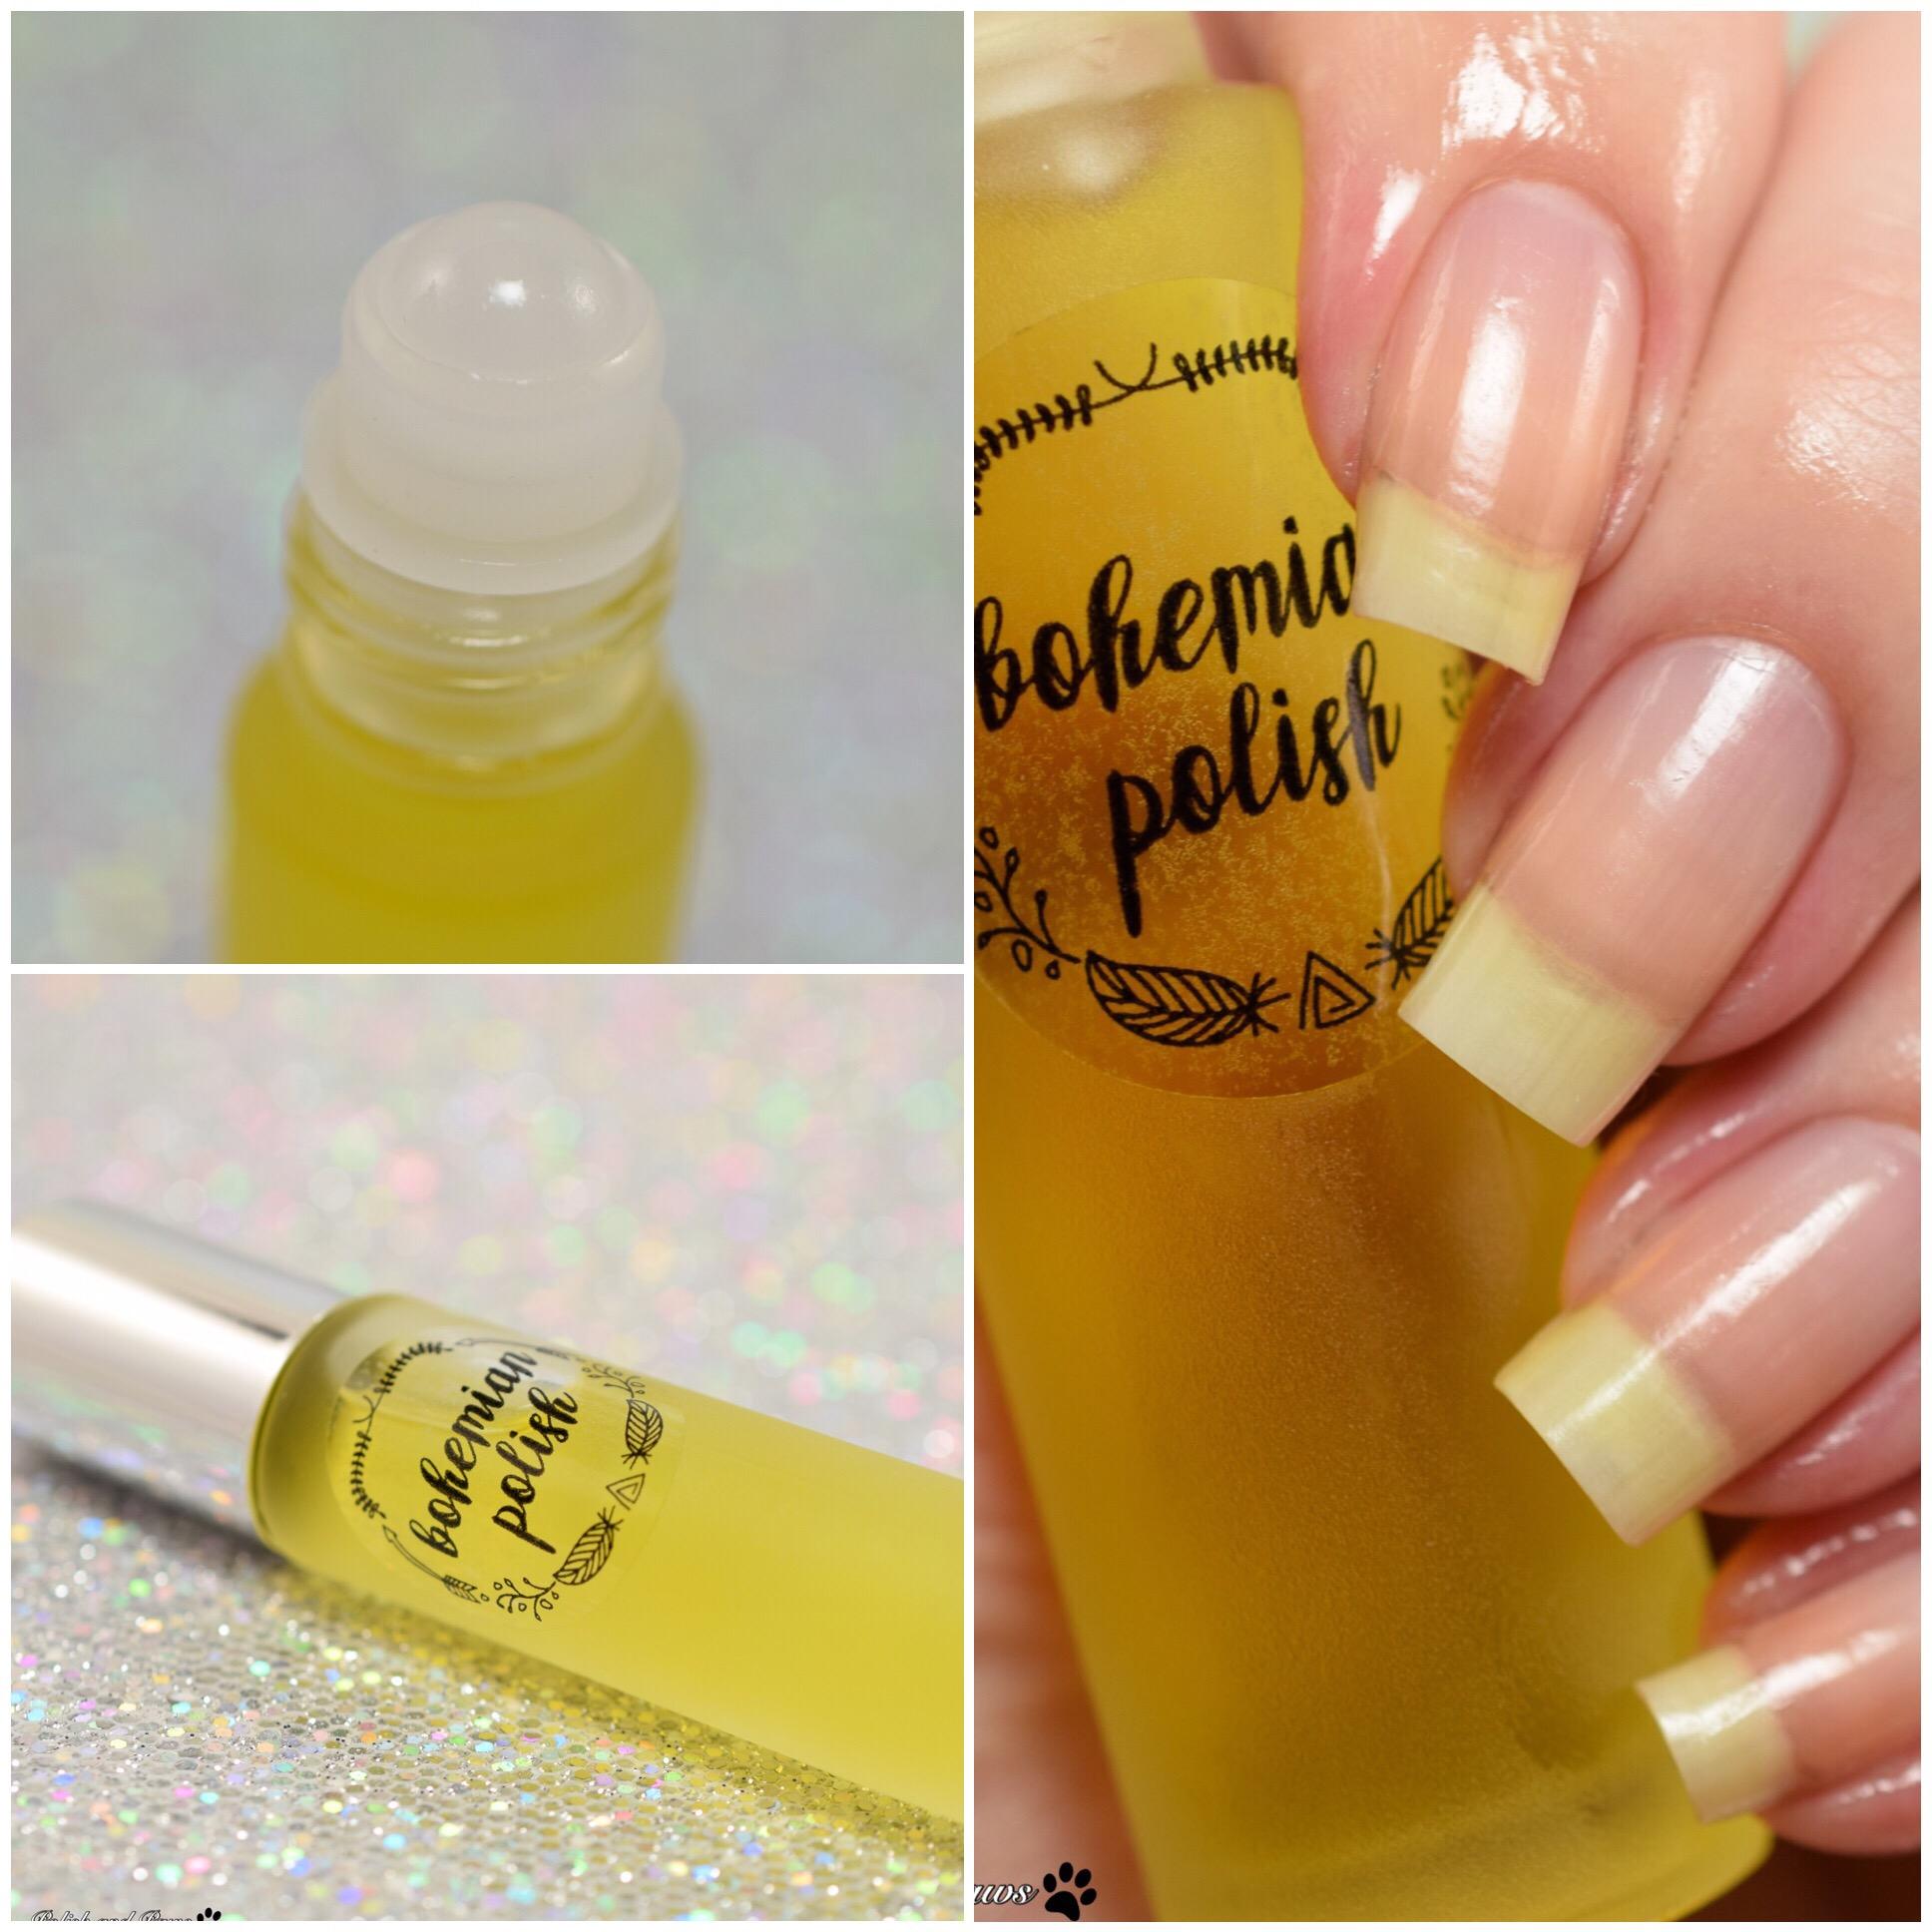 Bohemian Polish Butterbeer Cuticle oil